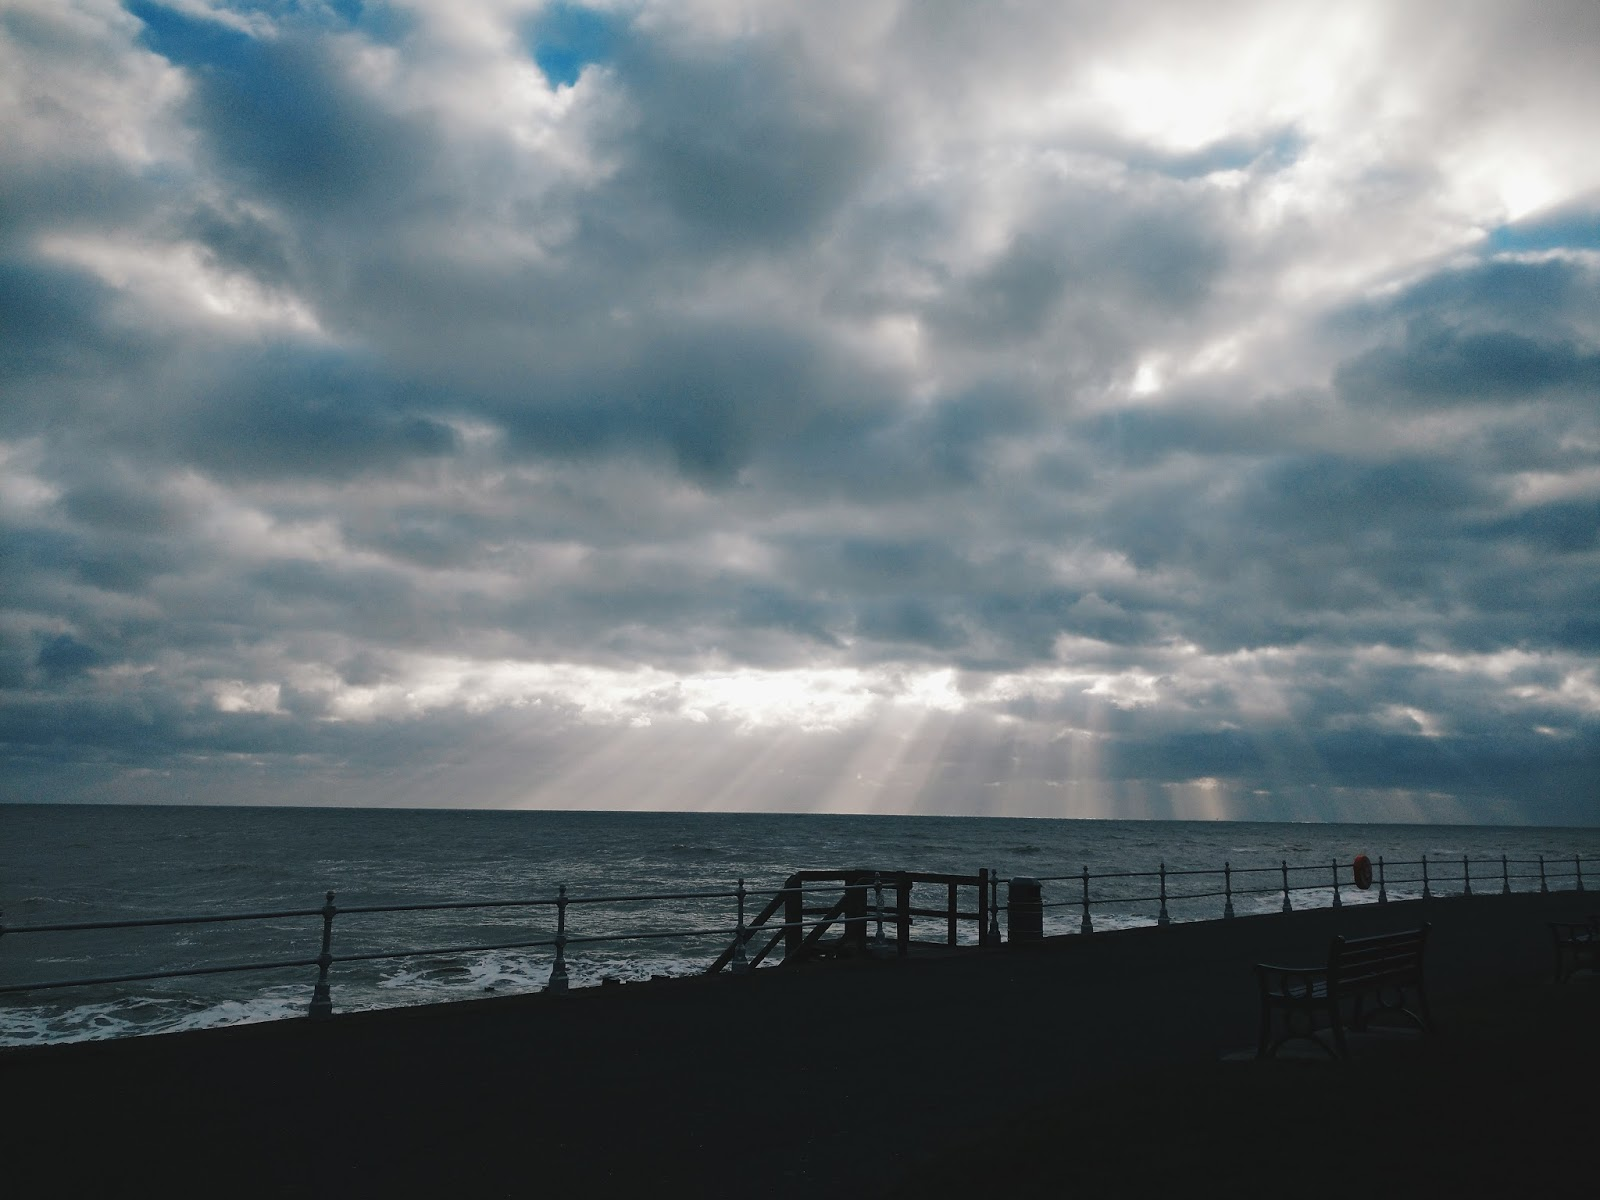 sun shining through the clouds at the beach